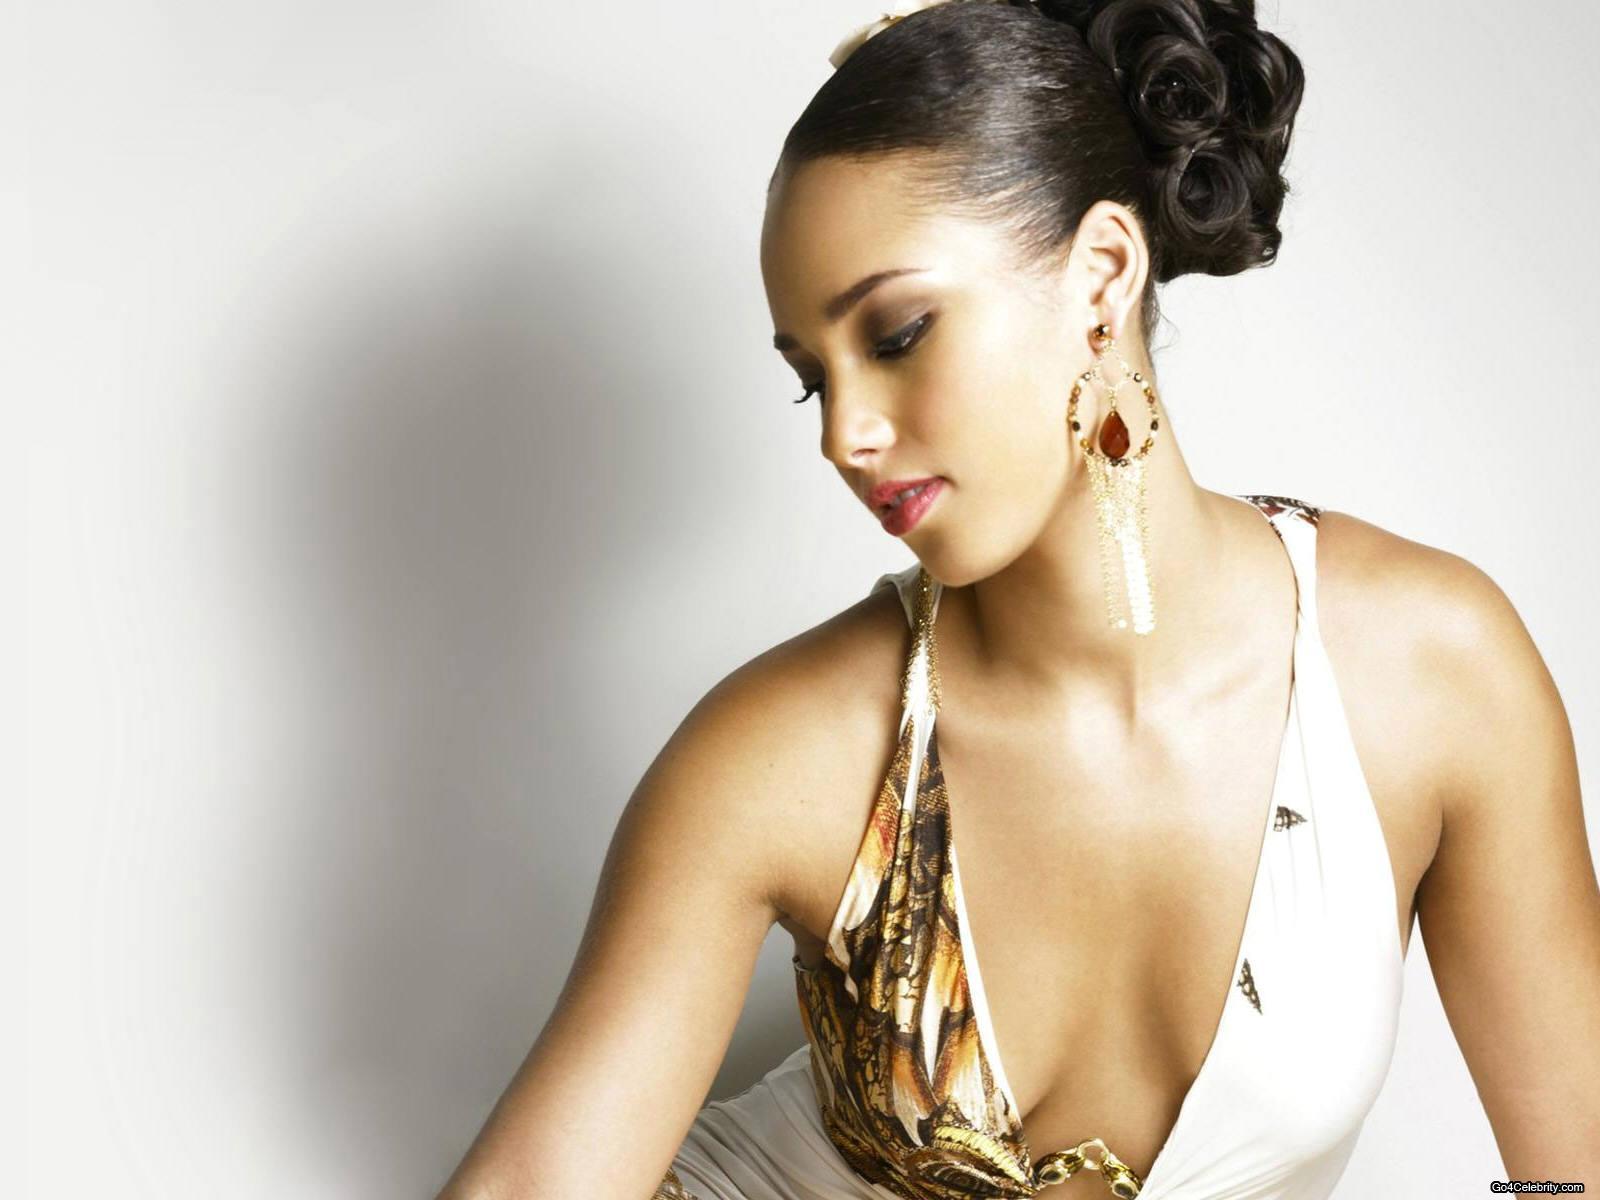 http://3.bp.blogspot.com/-u9IfHKsxQps/TzRRDzlE7nI/AAAAAAAAA0w/Jk3oU45Zk9Q/s1600/alicia+keys+hairstyles.jpg